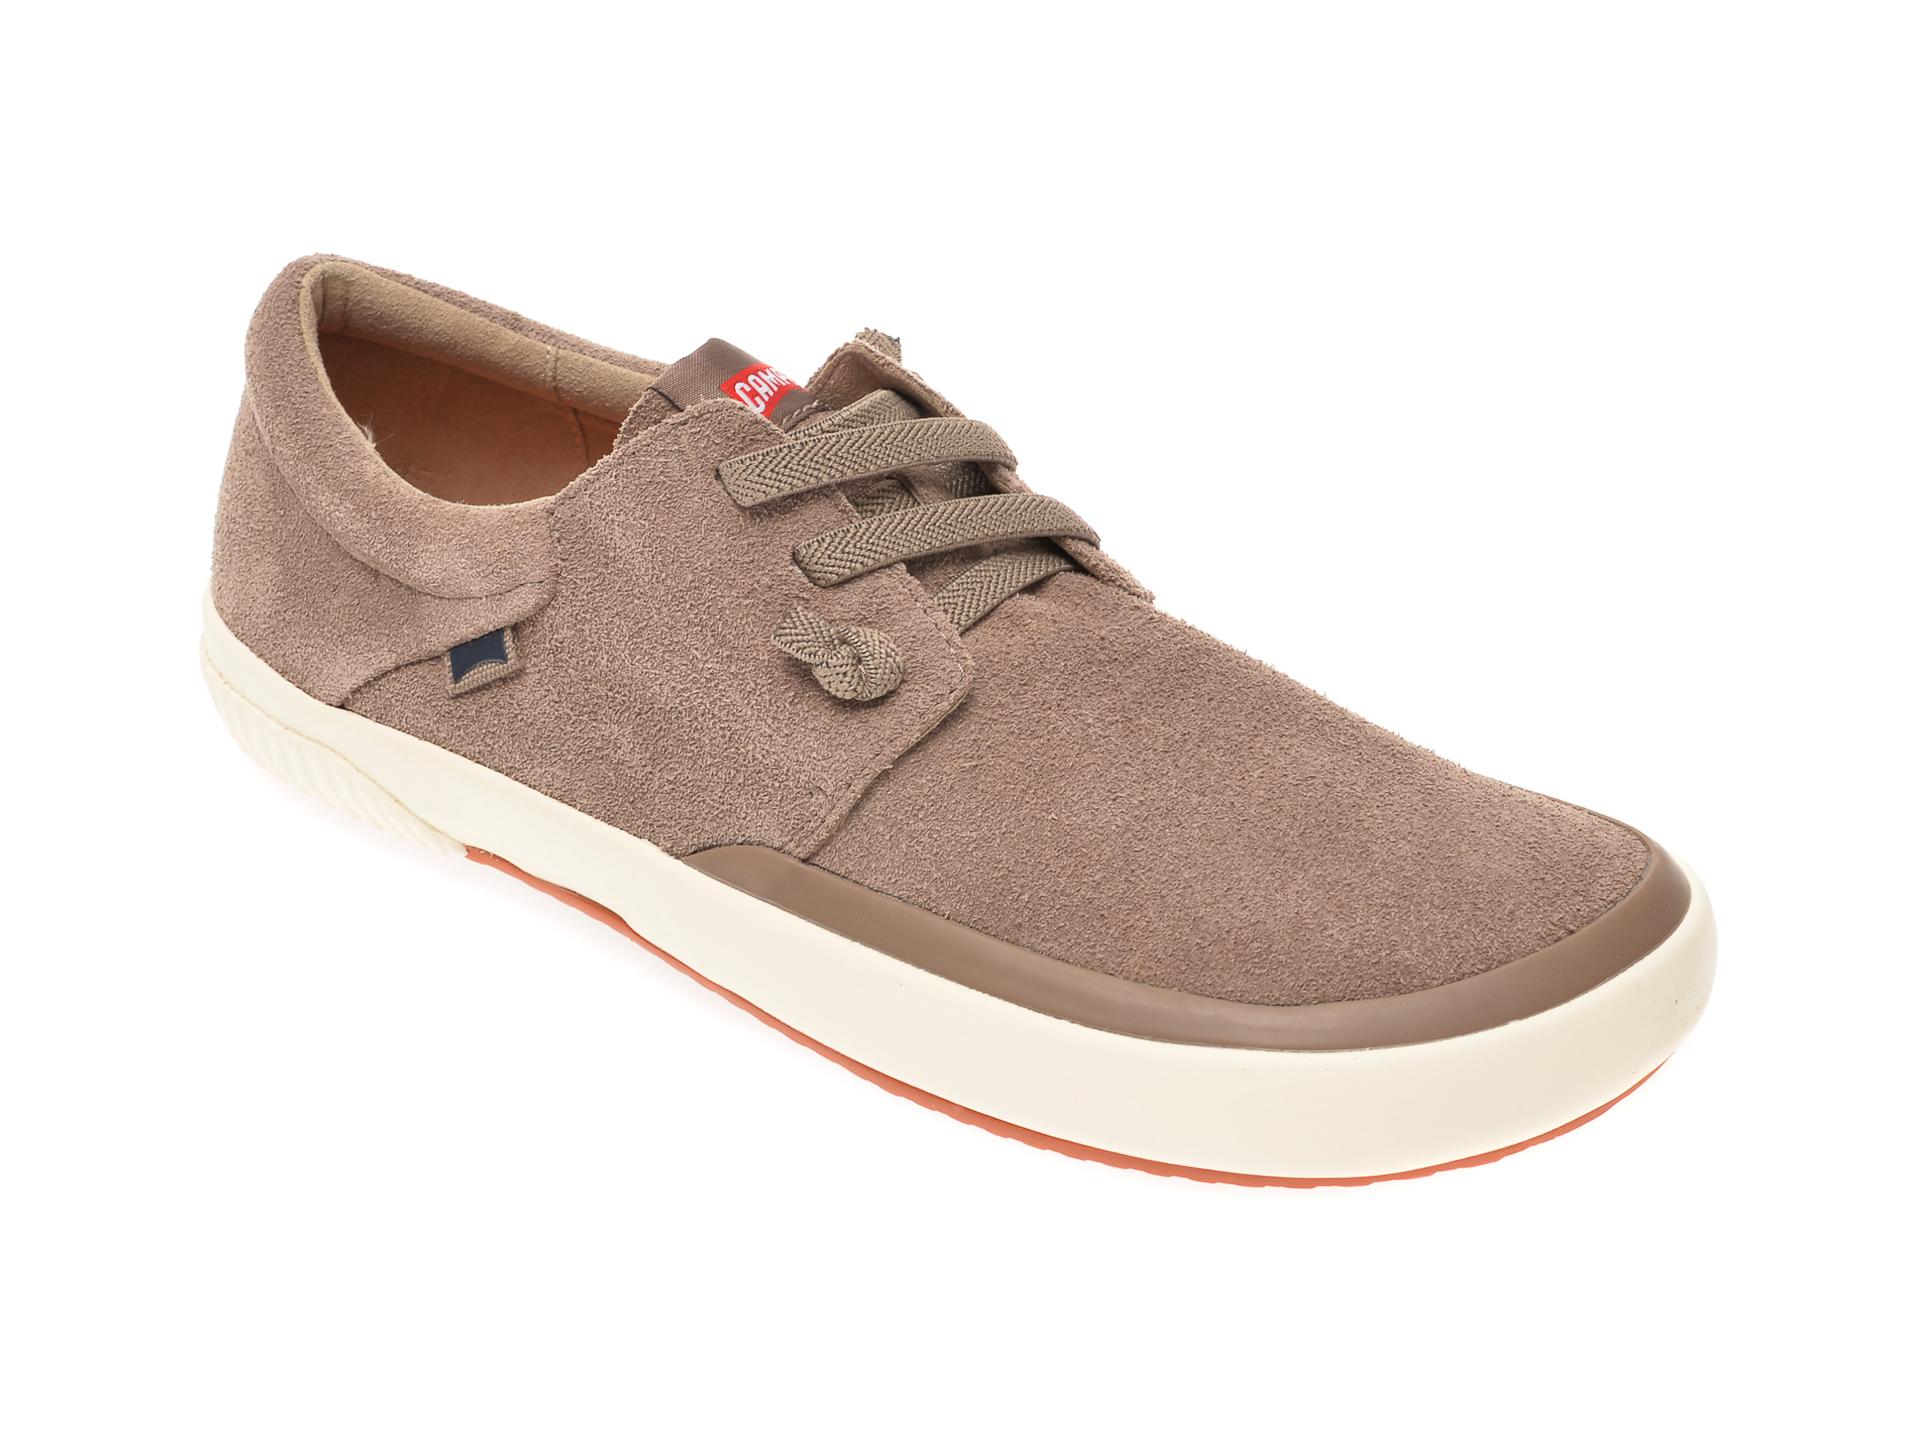 Pantofi CAMPER maro, K100414, din piele intoarsa